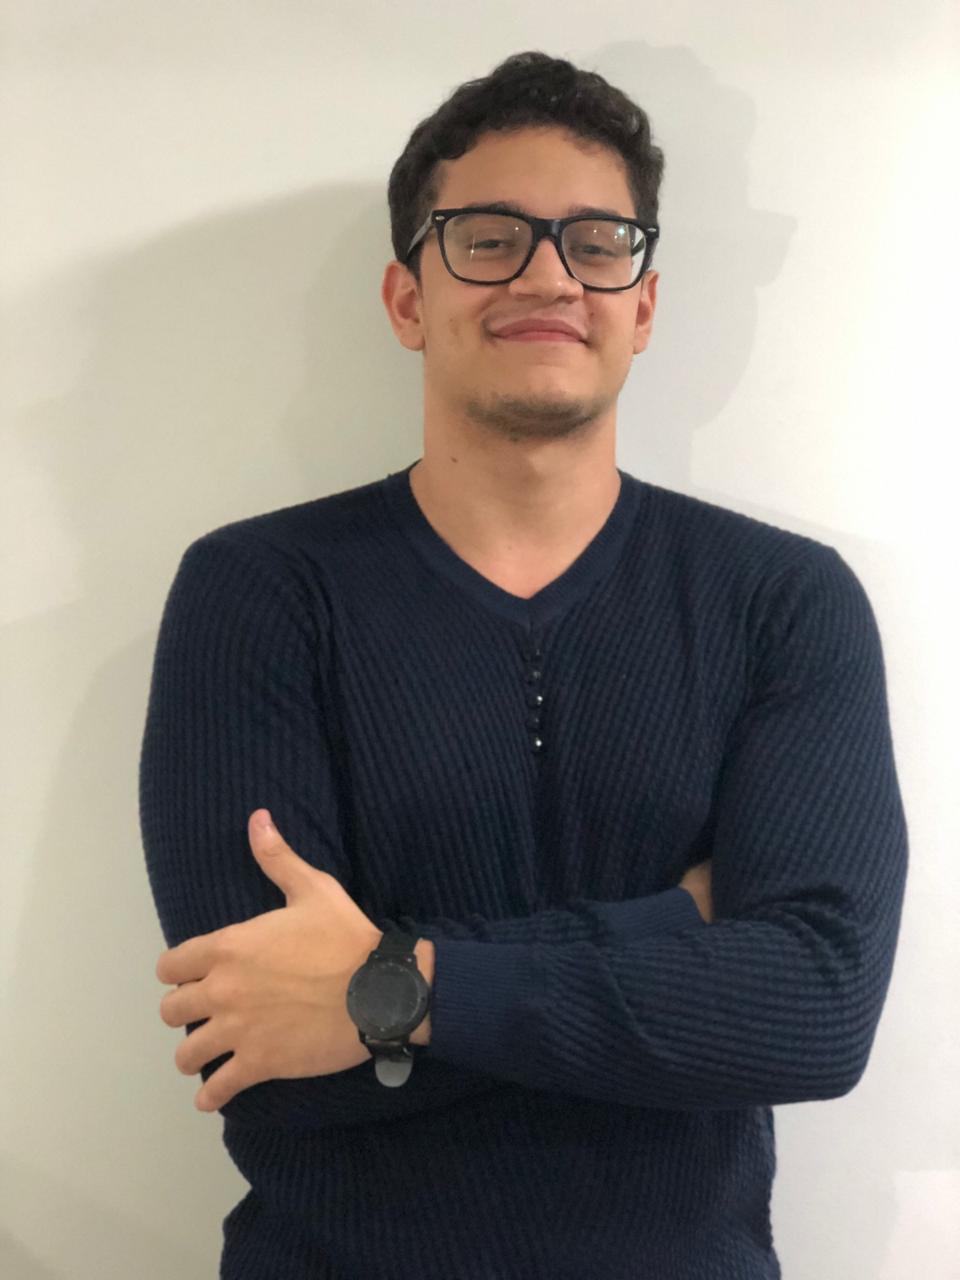 Guilherme Pontual